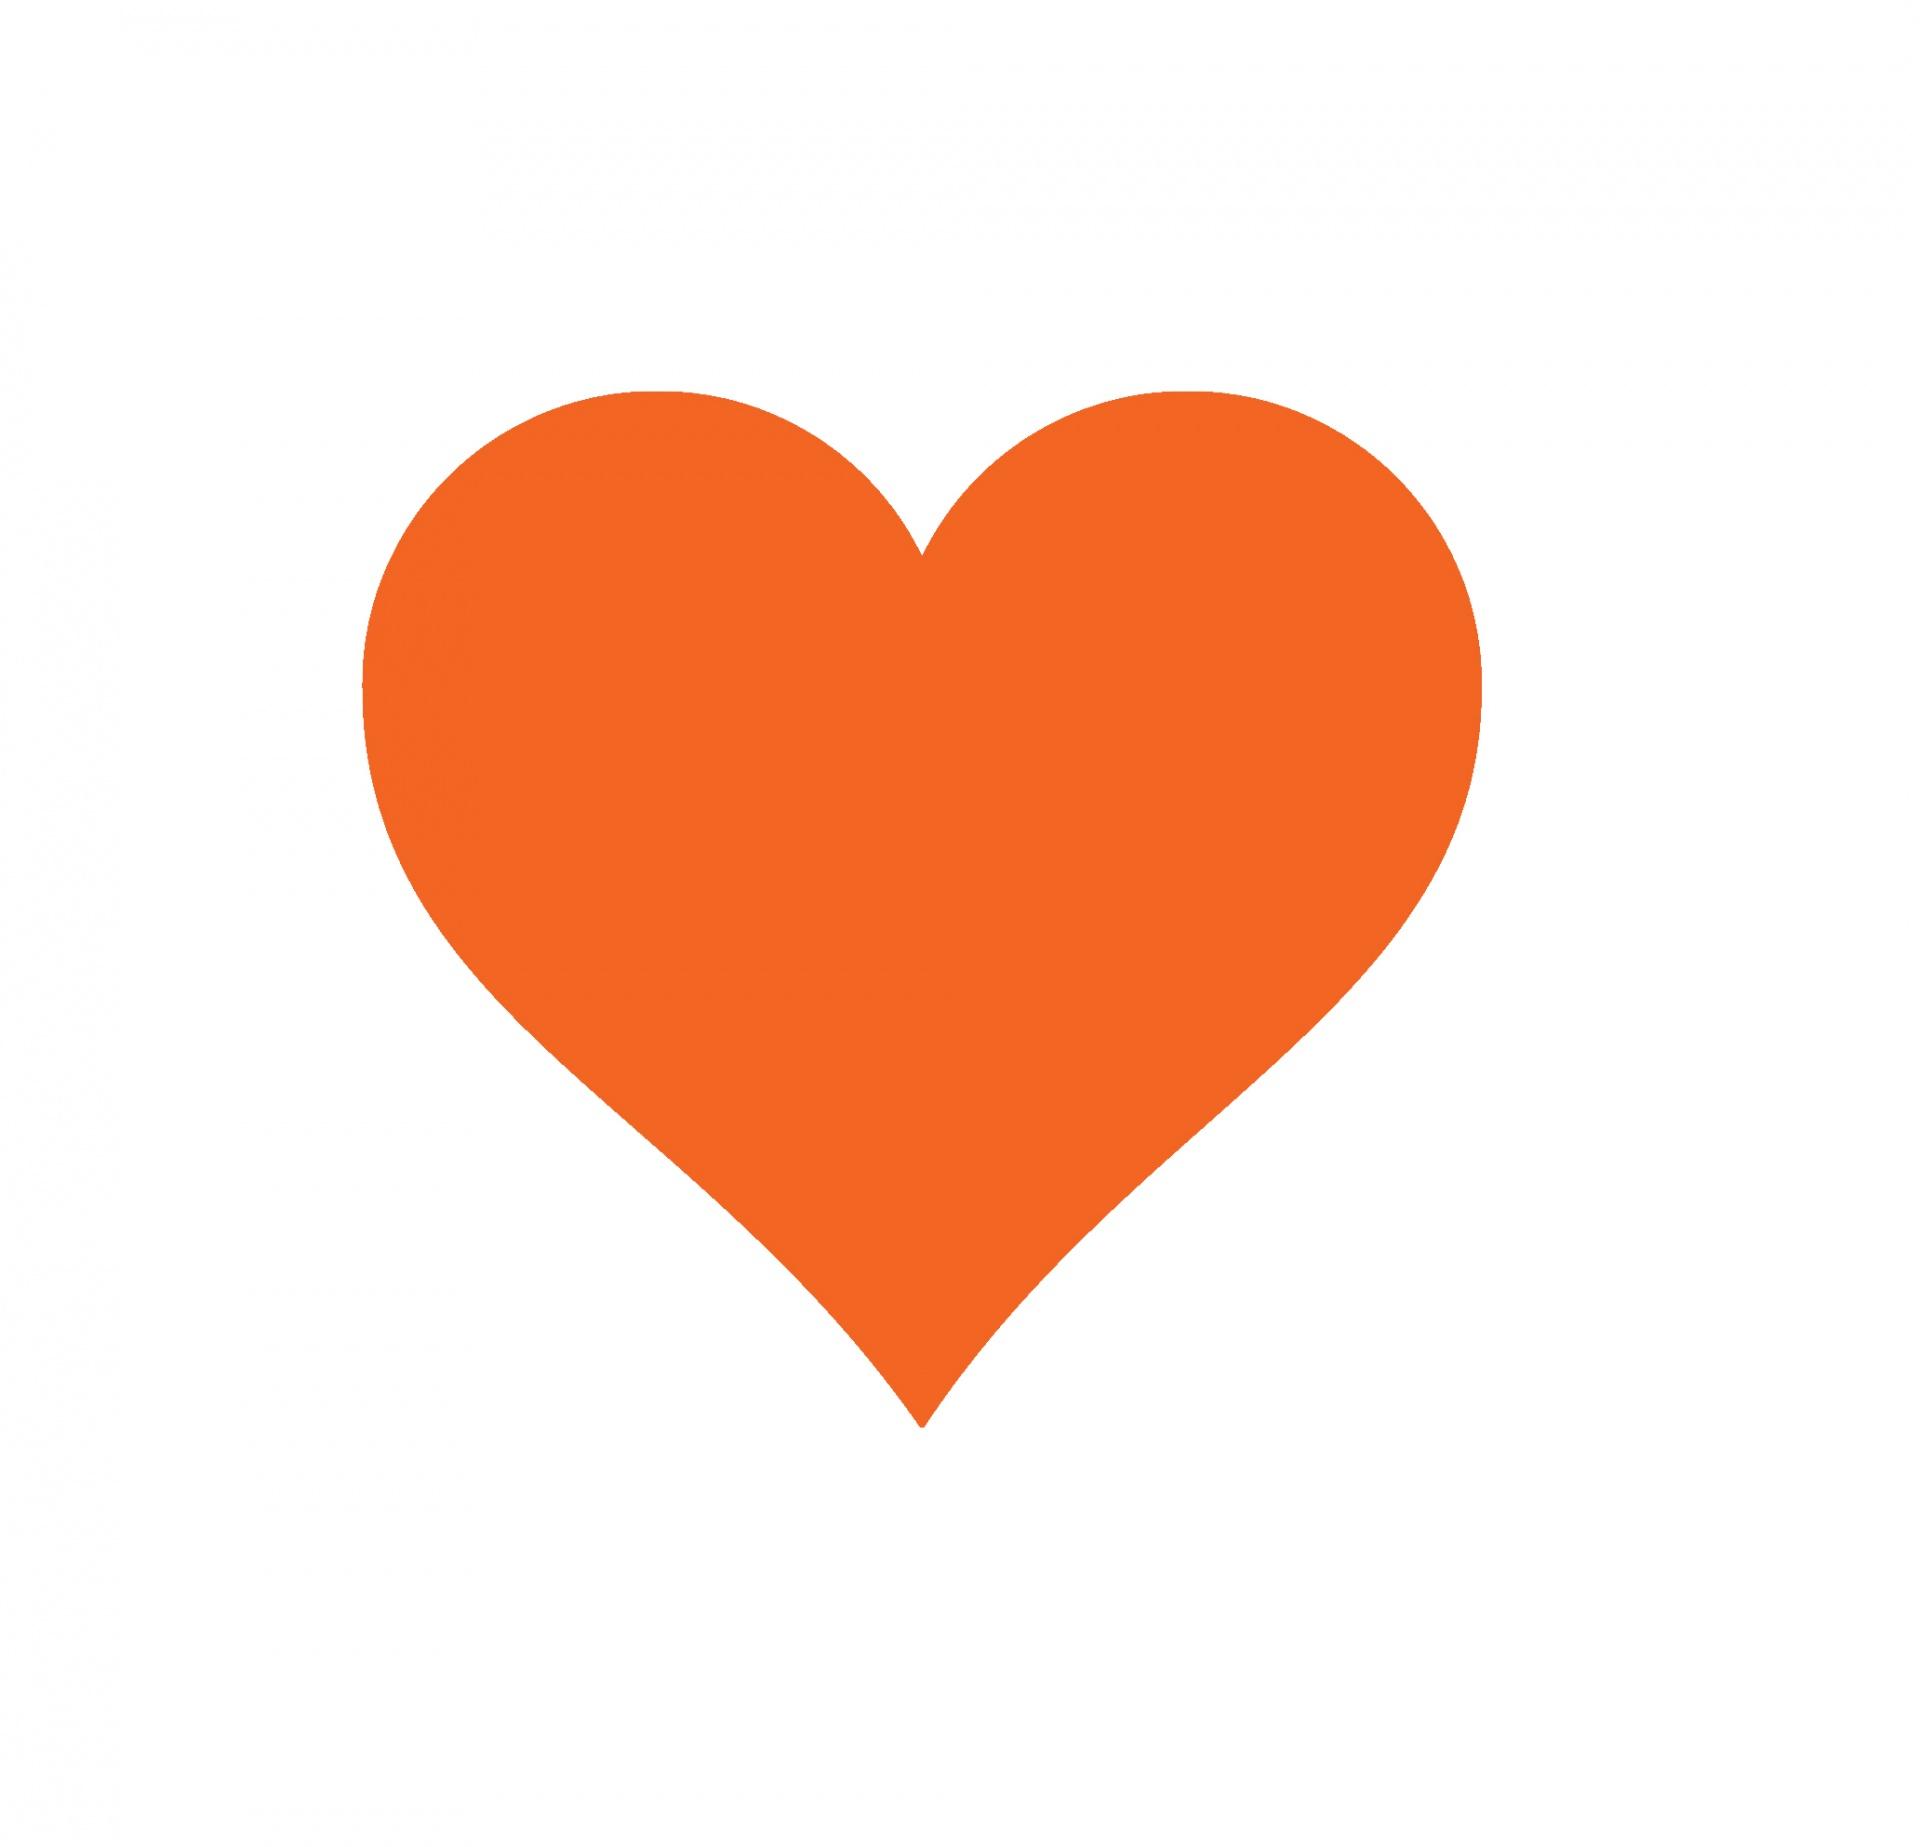 Orange Heart Free Stock Photo.